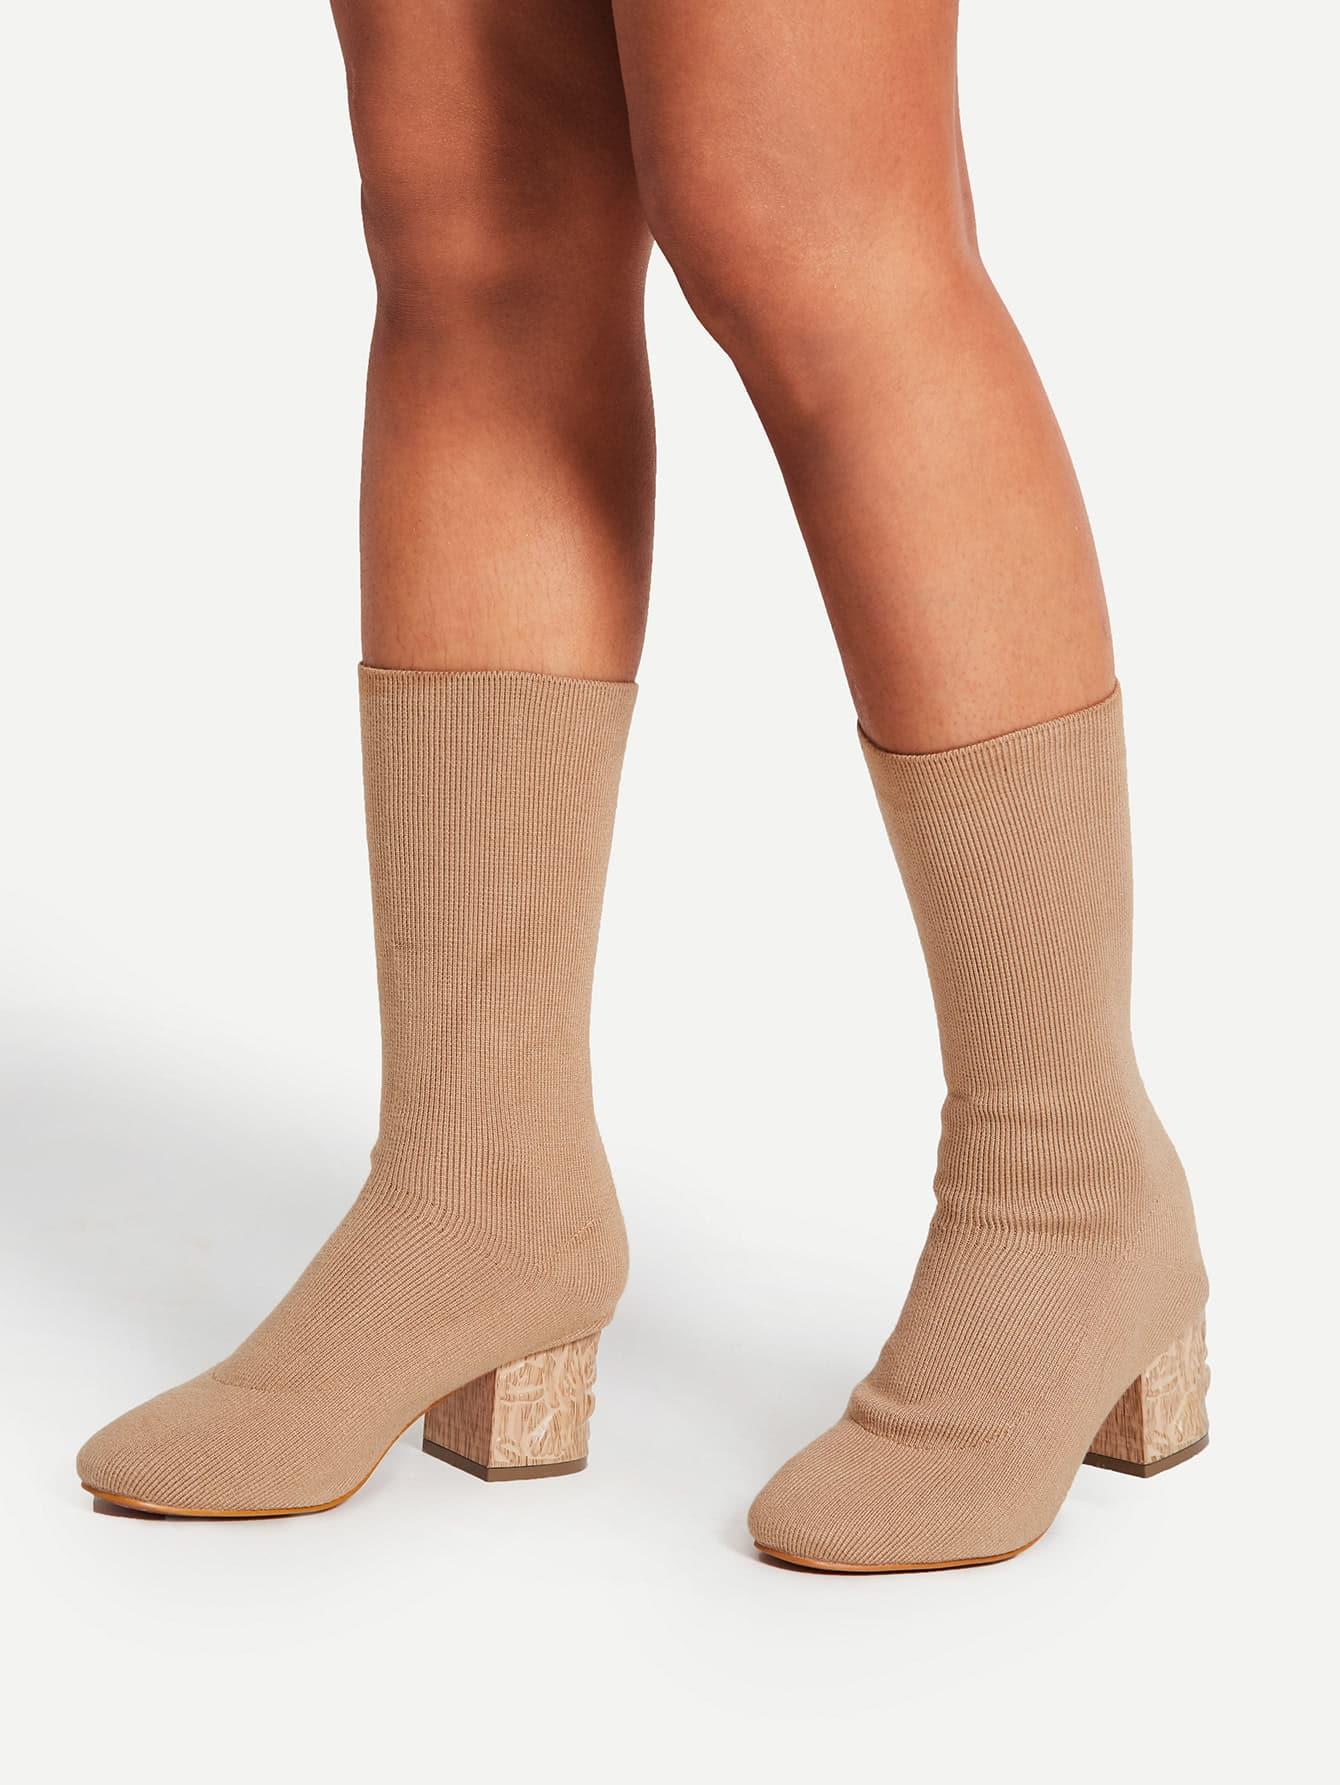 Knit Design Block Heeled Boots